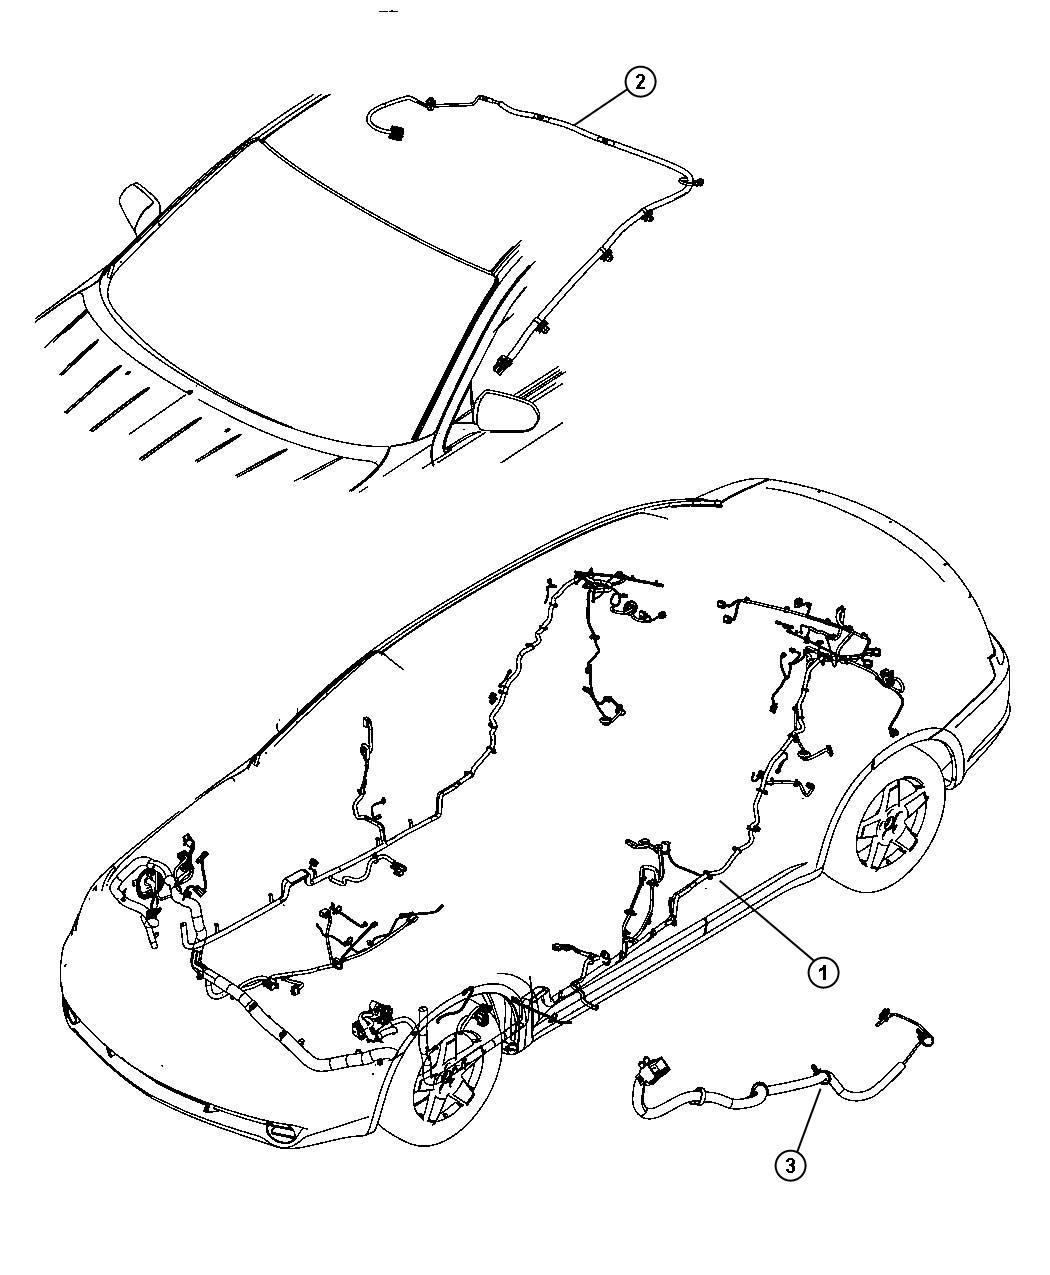 Dodge Avenger Wiring. Unified body. Export. Mopar